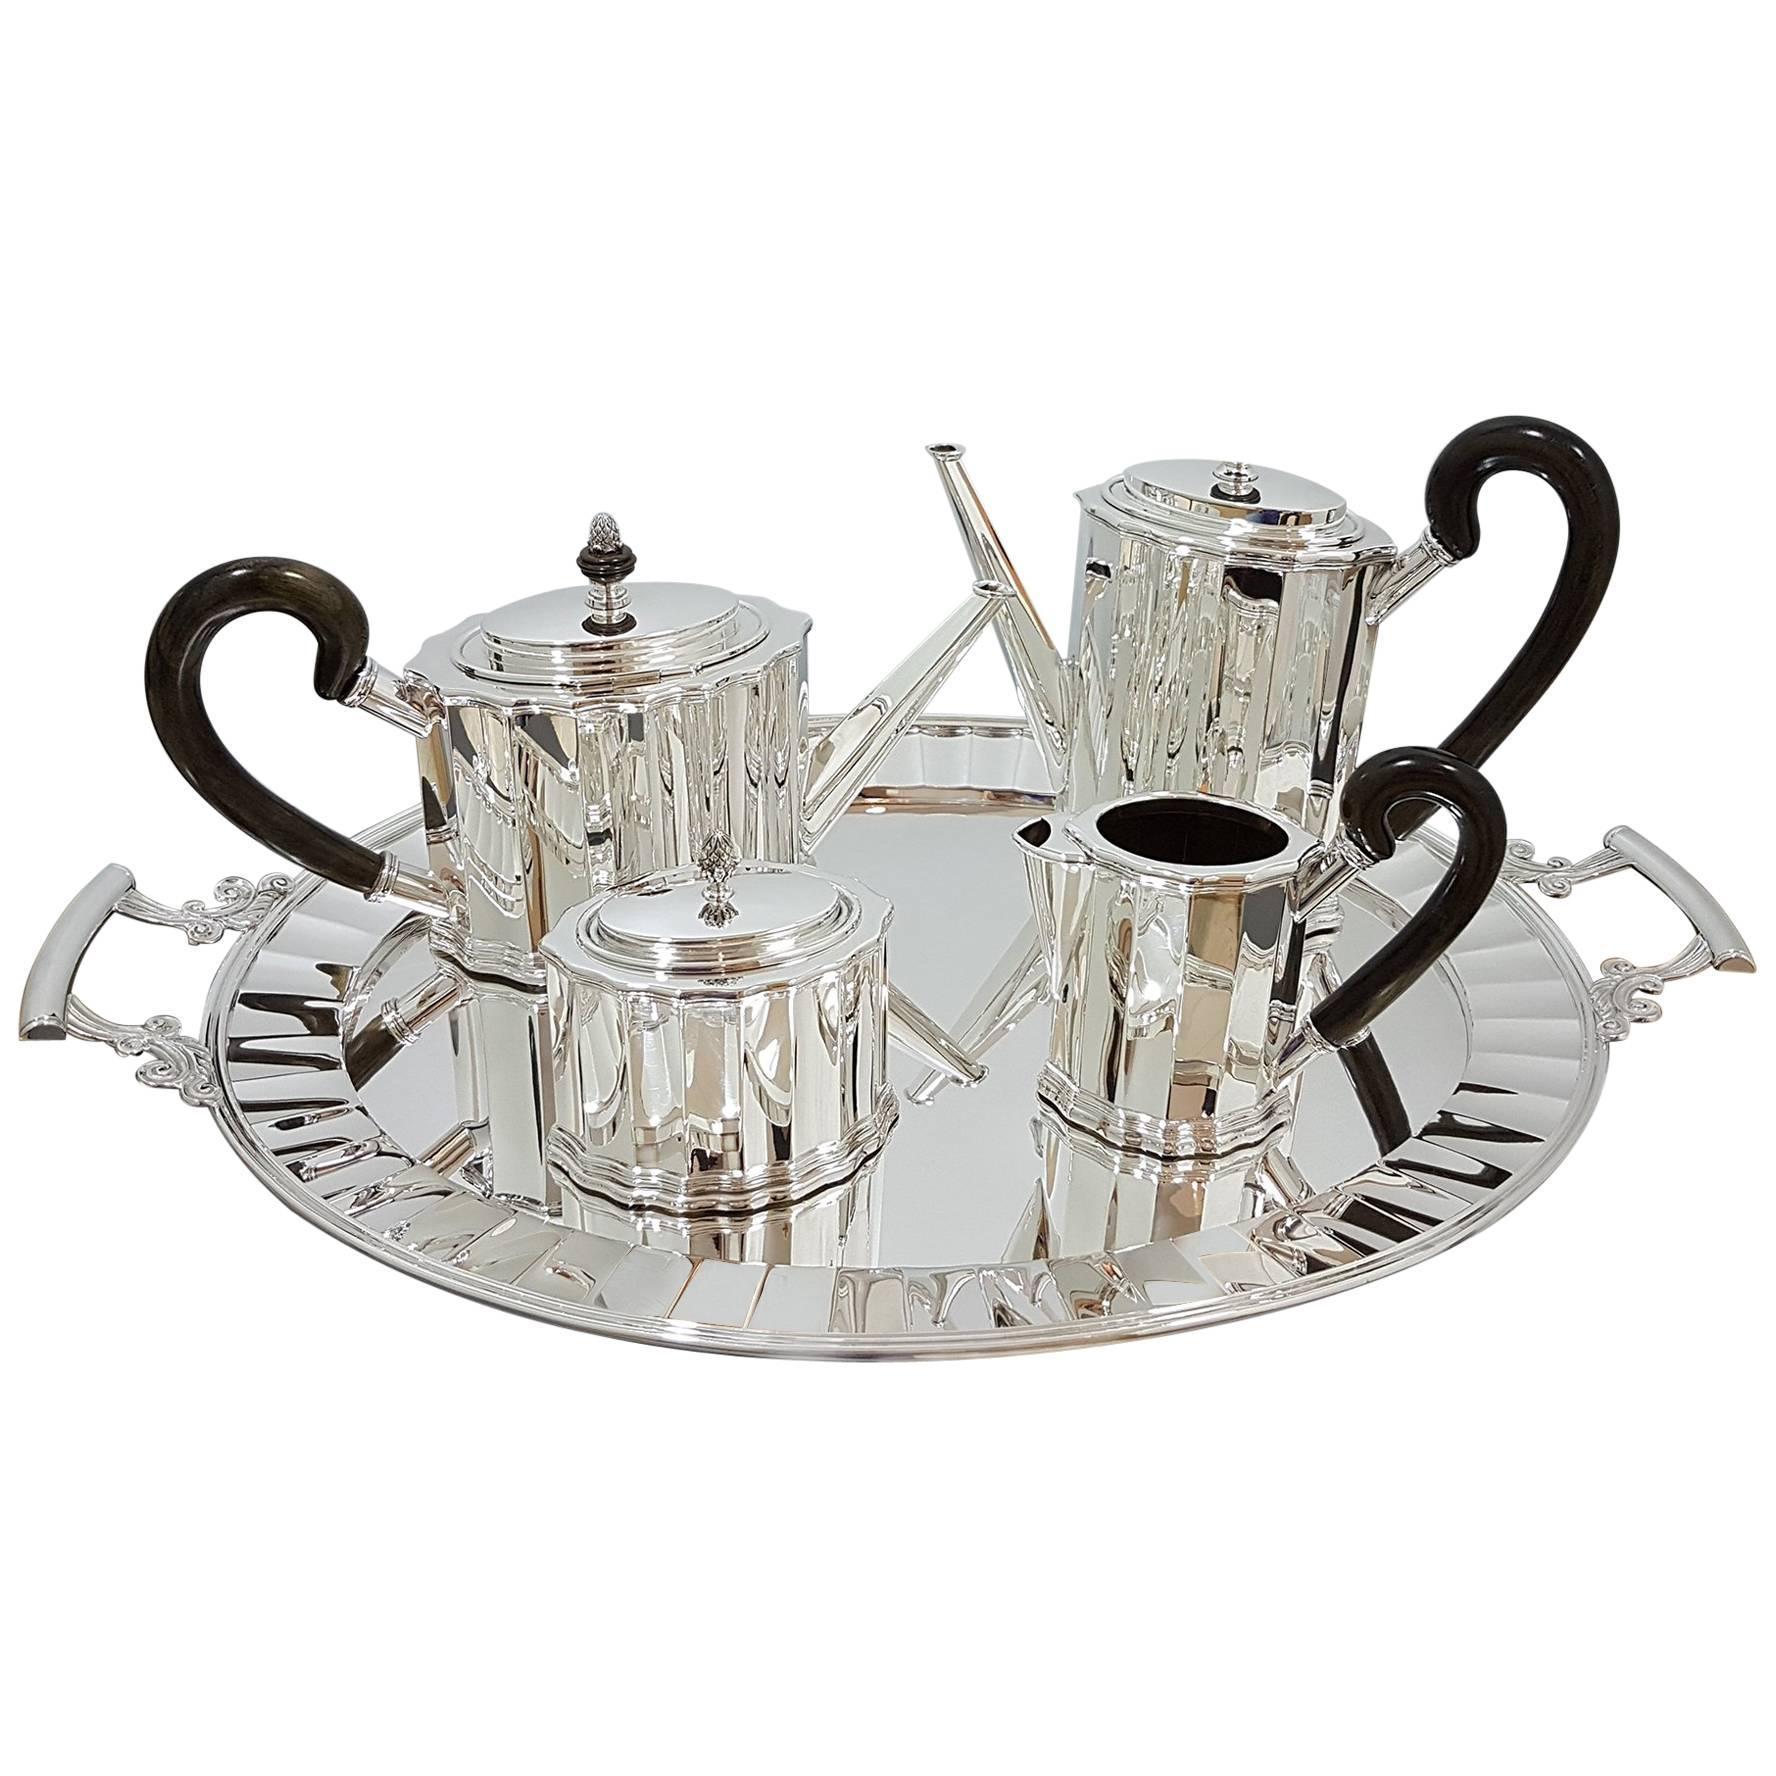 20th Century Italian Sterling Silver Tea Coffee Set Plus Tray Woodden Handles